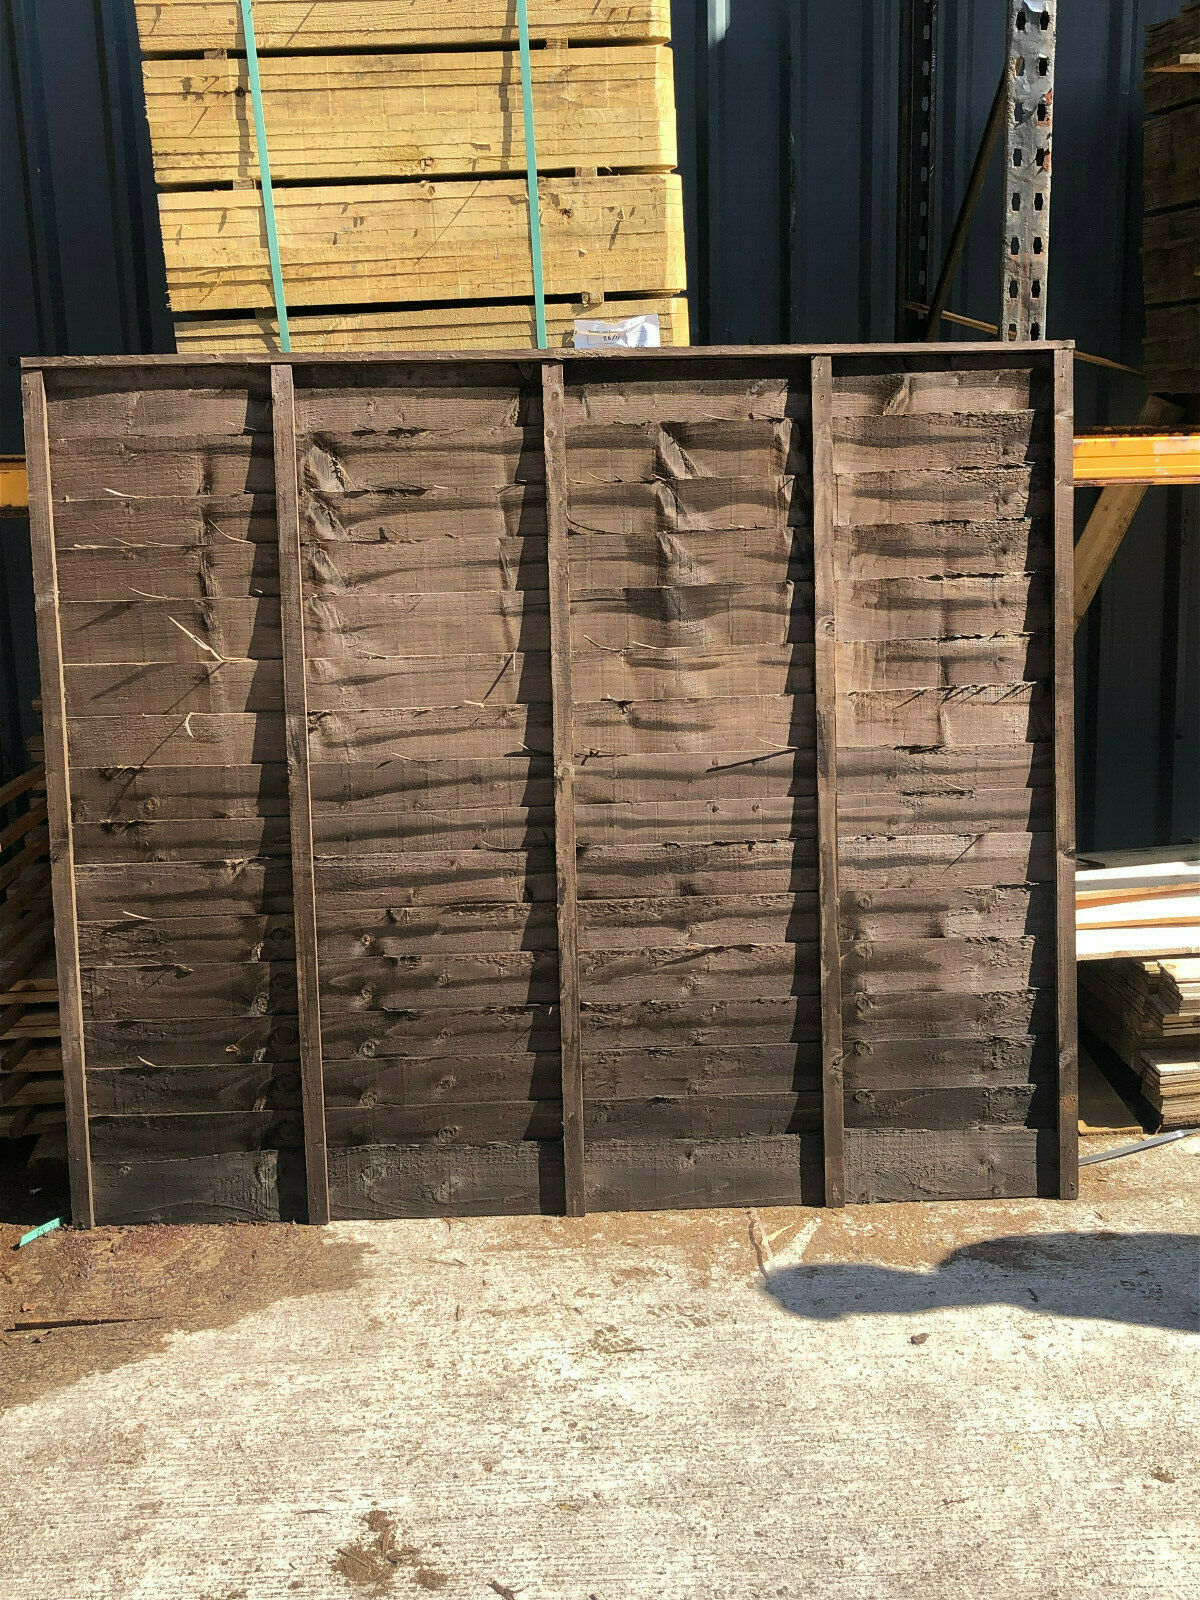 garden fence - 6 x 3 Budget Over lap Garden Fence panels